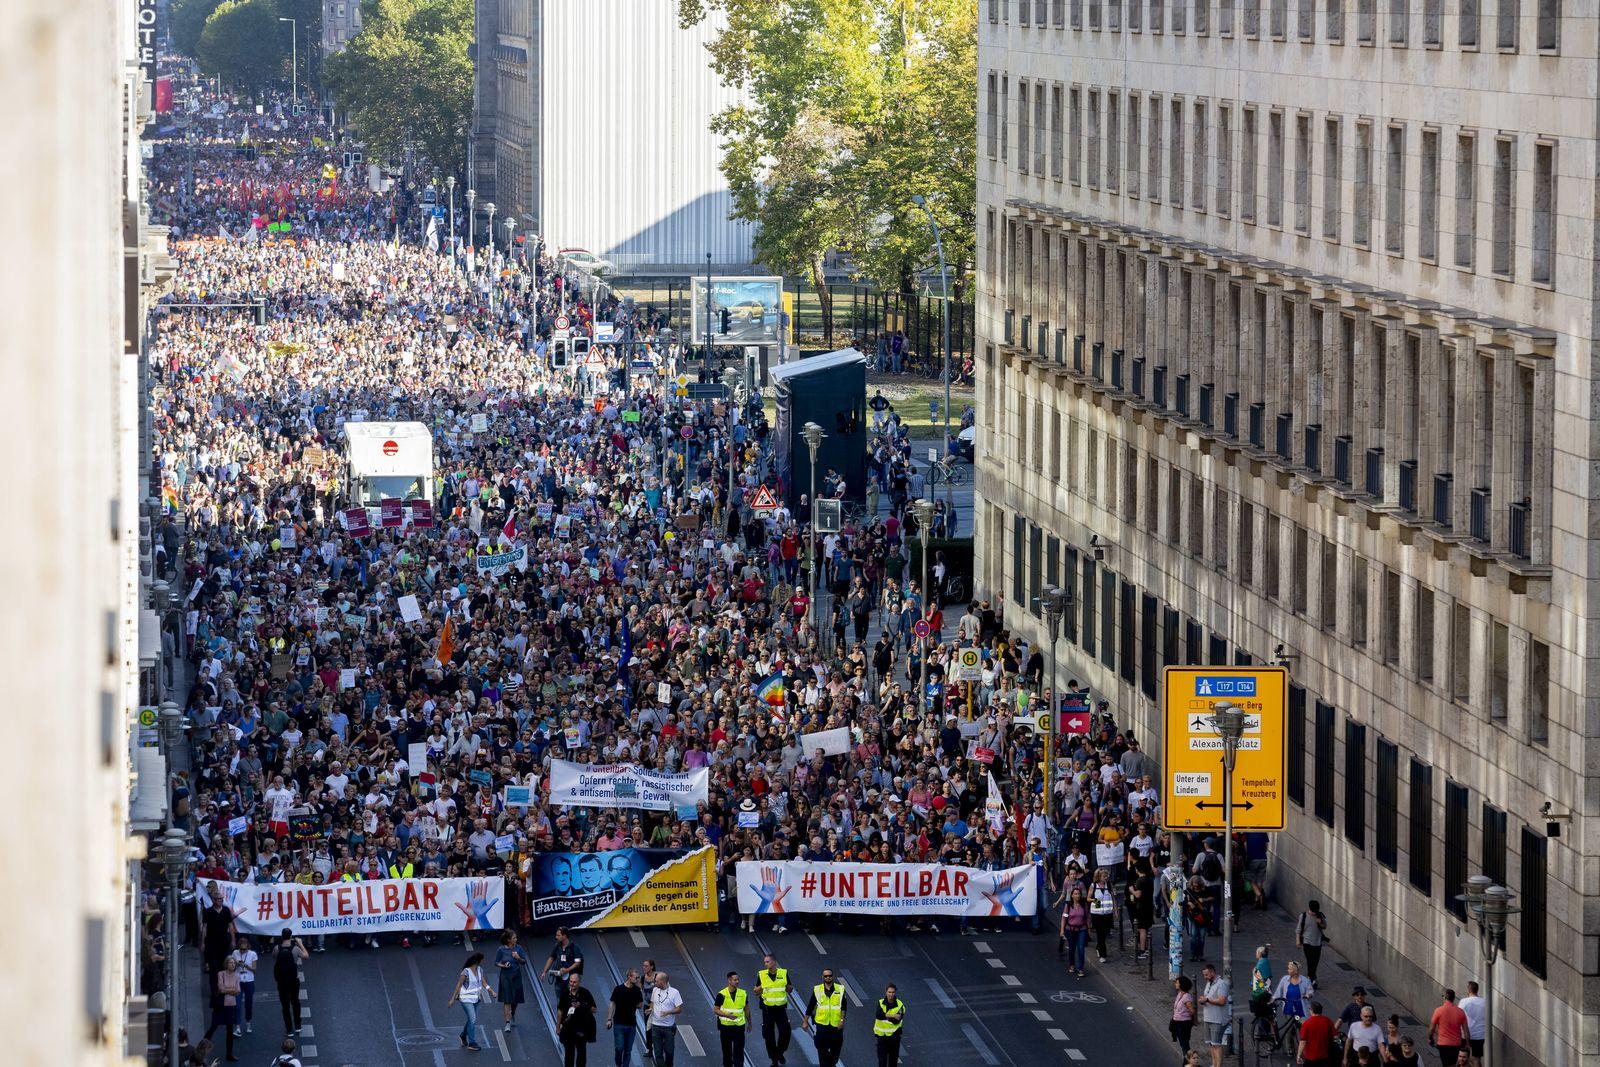 Berlin/ Kundgebung gegen Rassismus/ Unteilbar